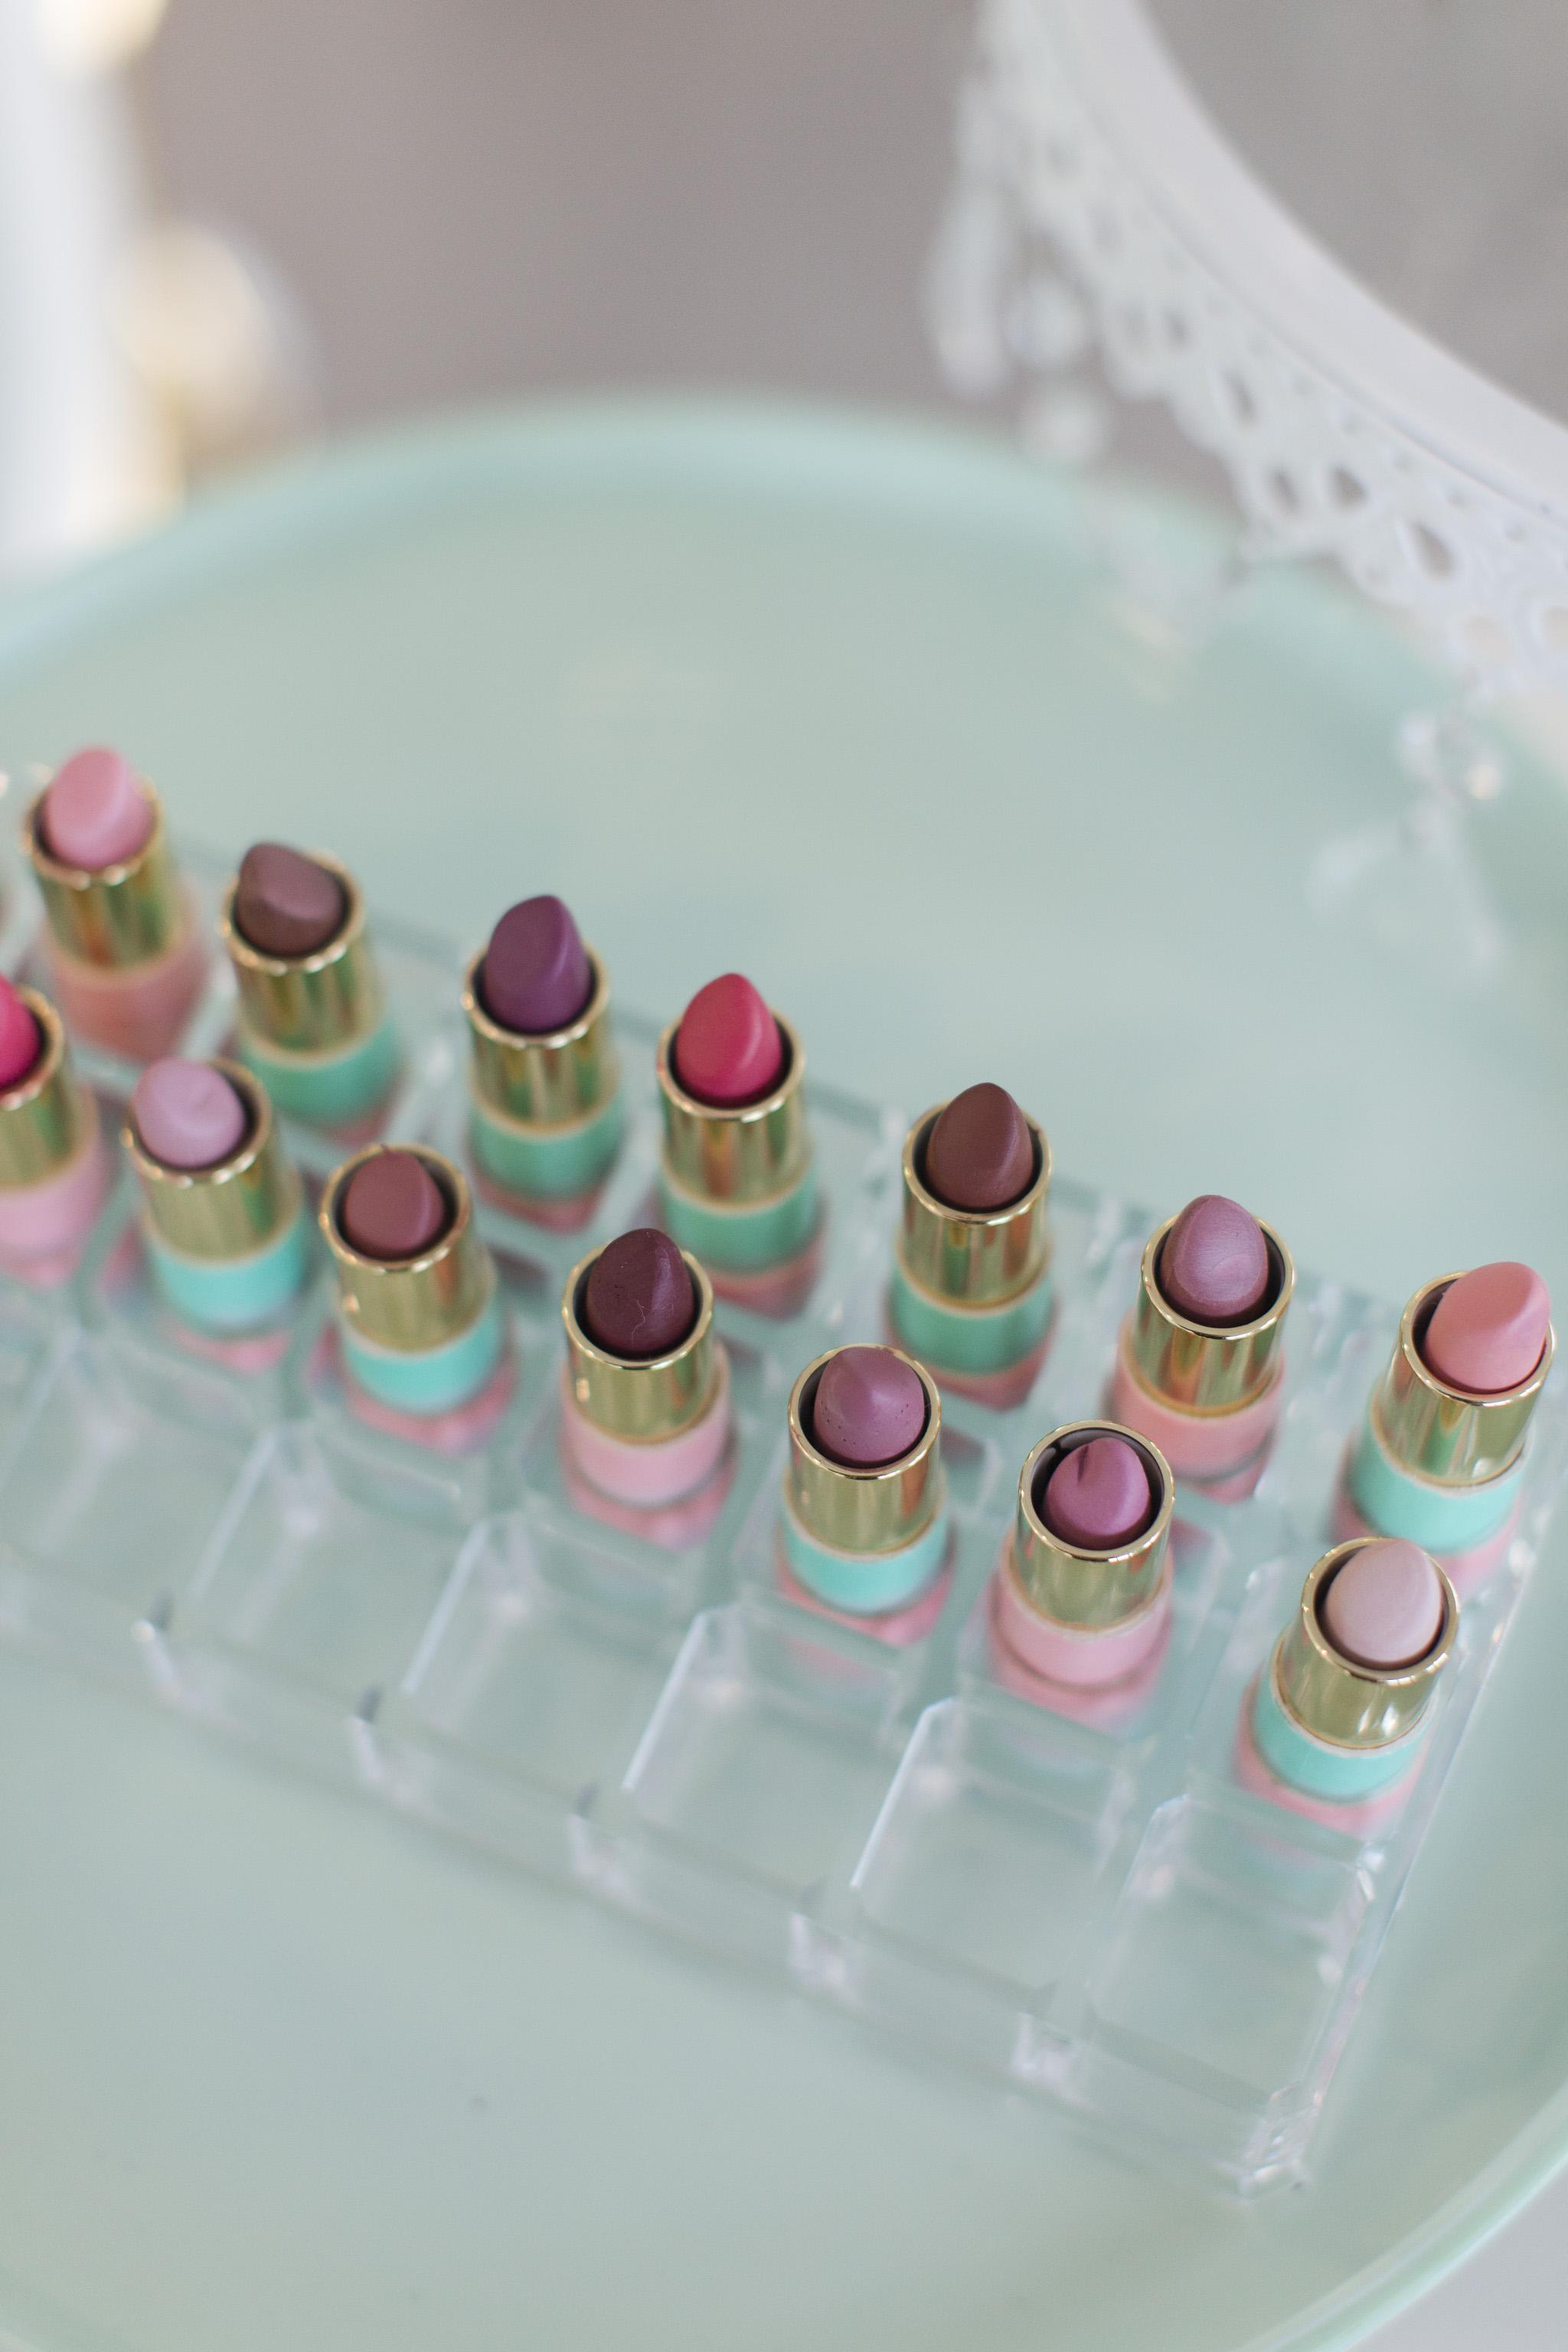 maison creme de la creme custom lipstick-3160.jpg